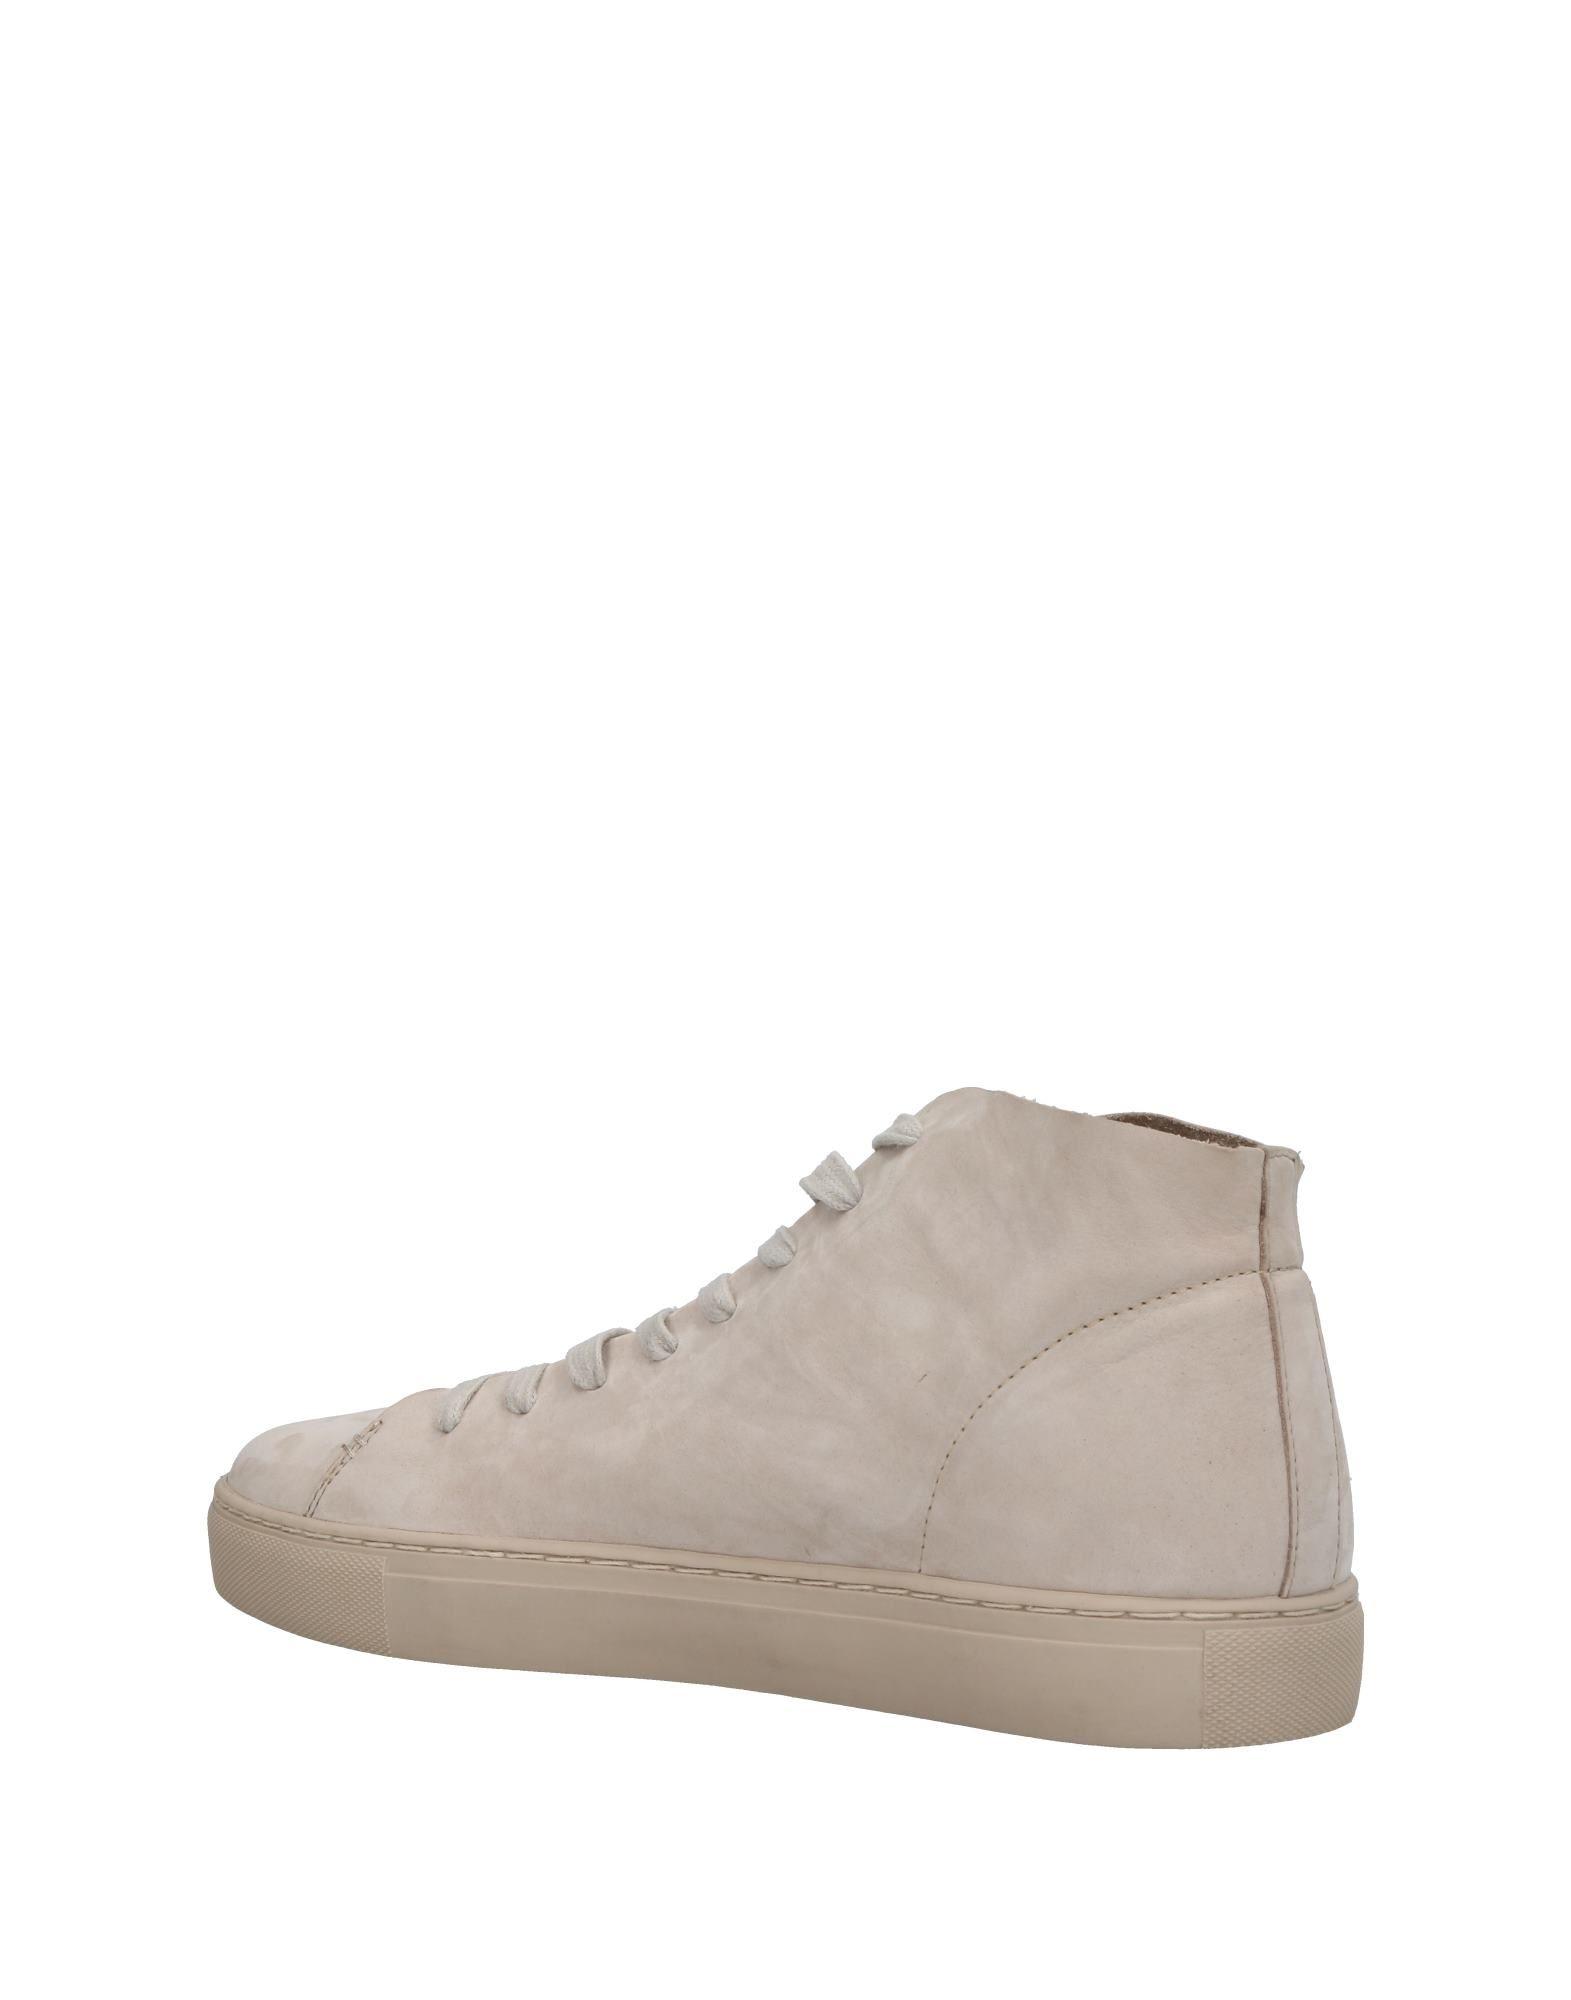 Crime London Sneakers Herren 11398307ST  11398307ST Herren Neue Schuhe 2b74db